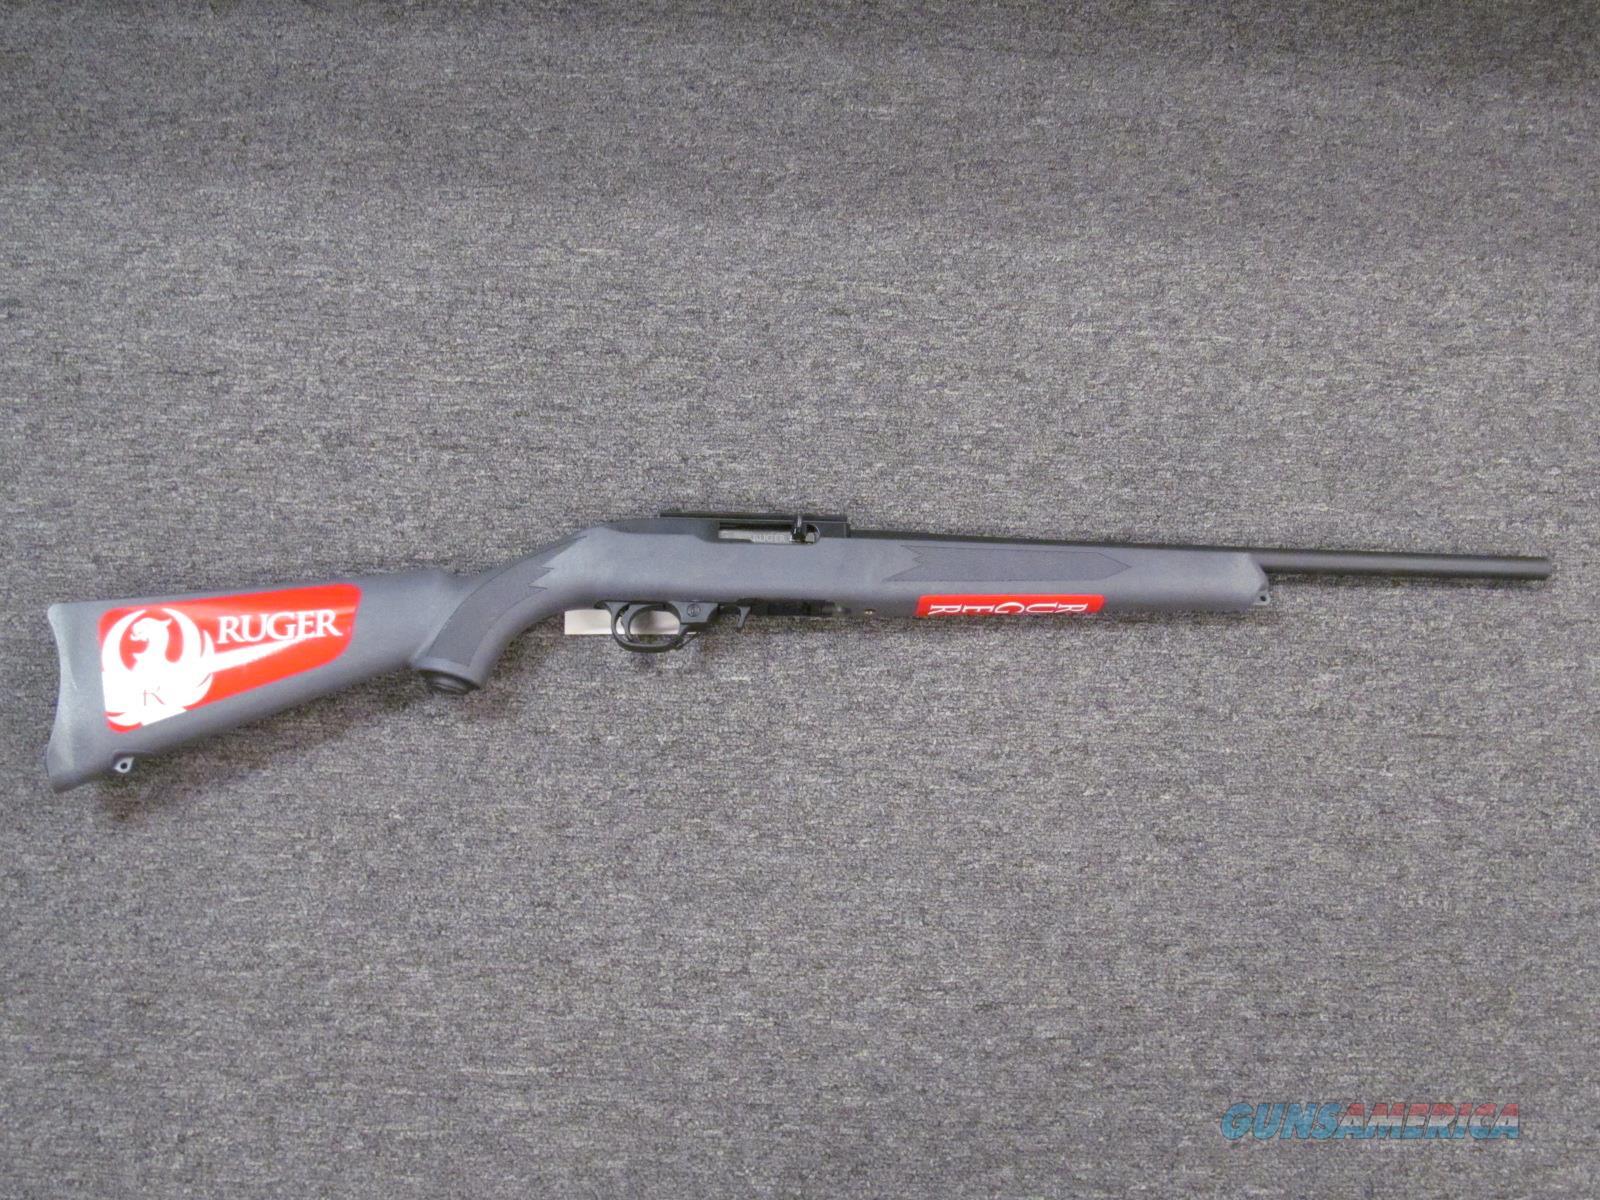 Ruger 10/22 w/Scope  Guns > Rifles > Ruger Rifles > 10-22